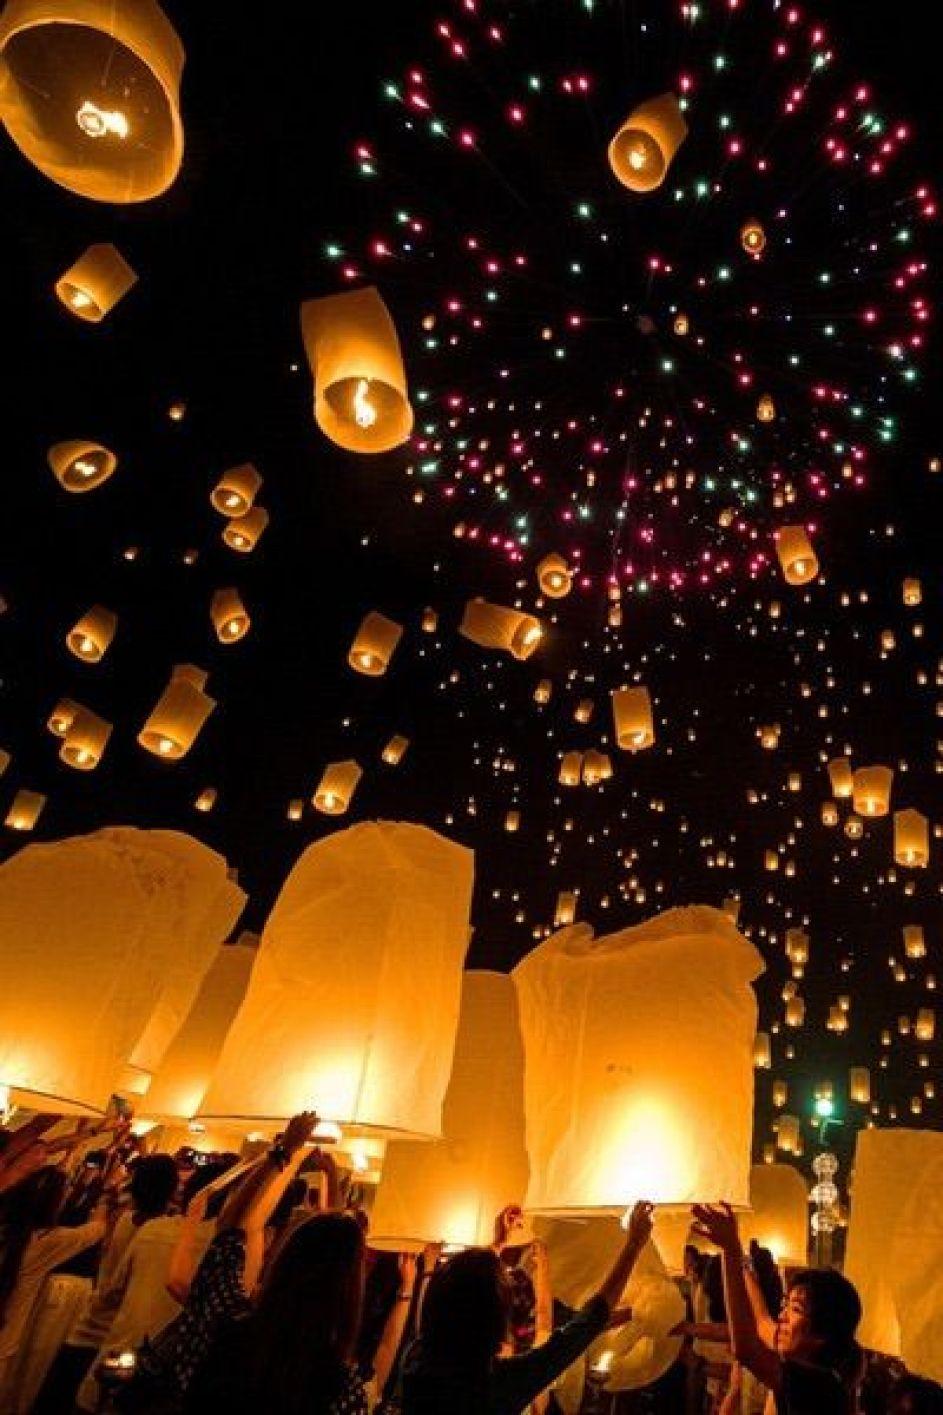 reasons to visit China - the Lantern Festival!